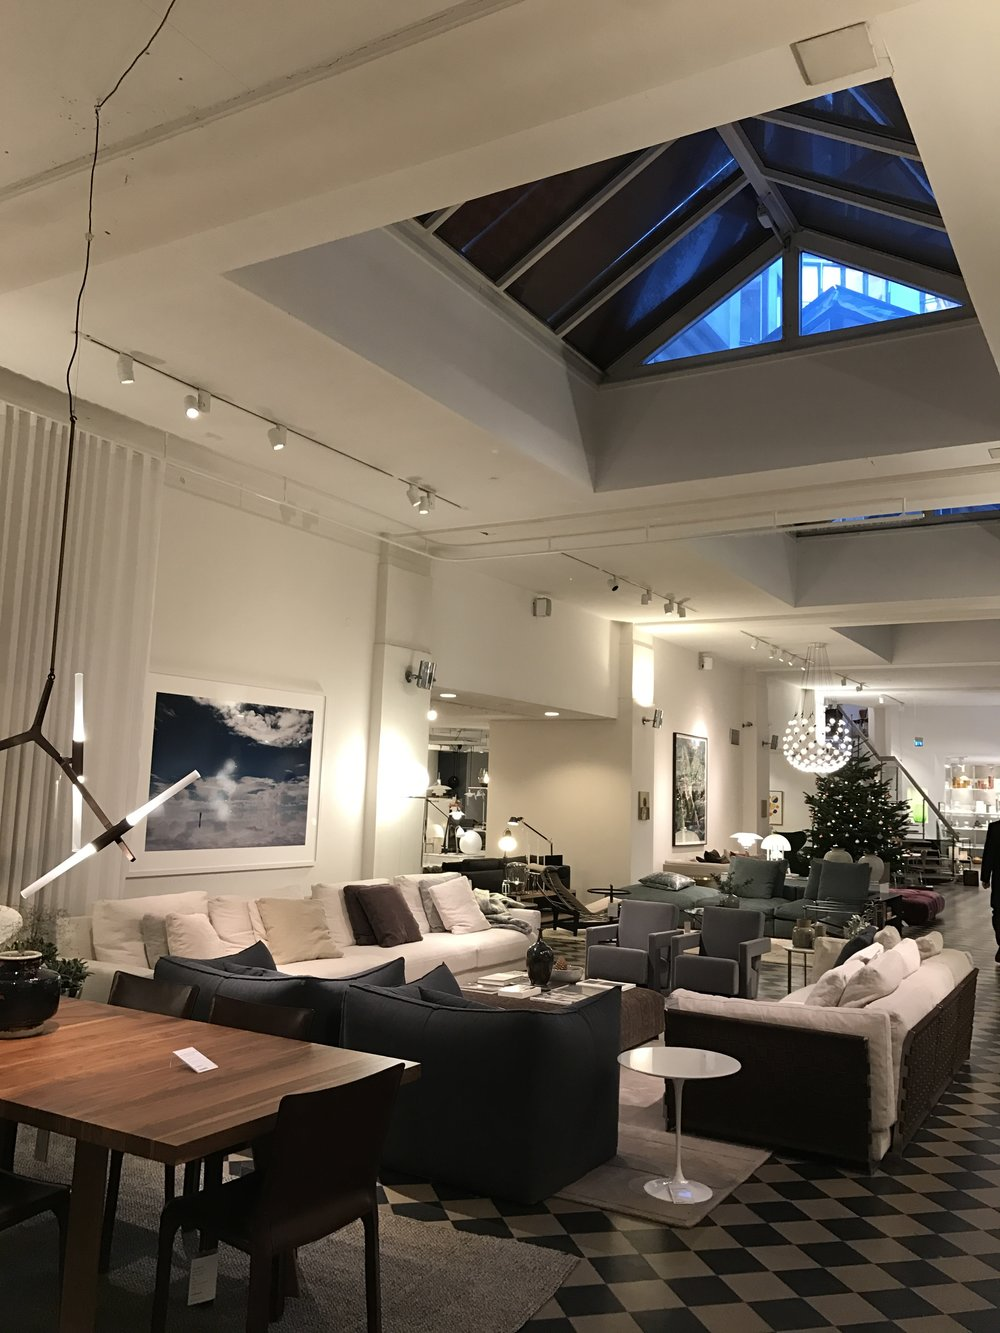 Amazing home interior boutique in Ostermalm